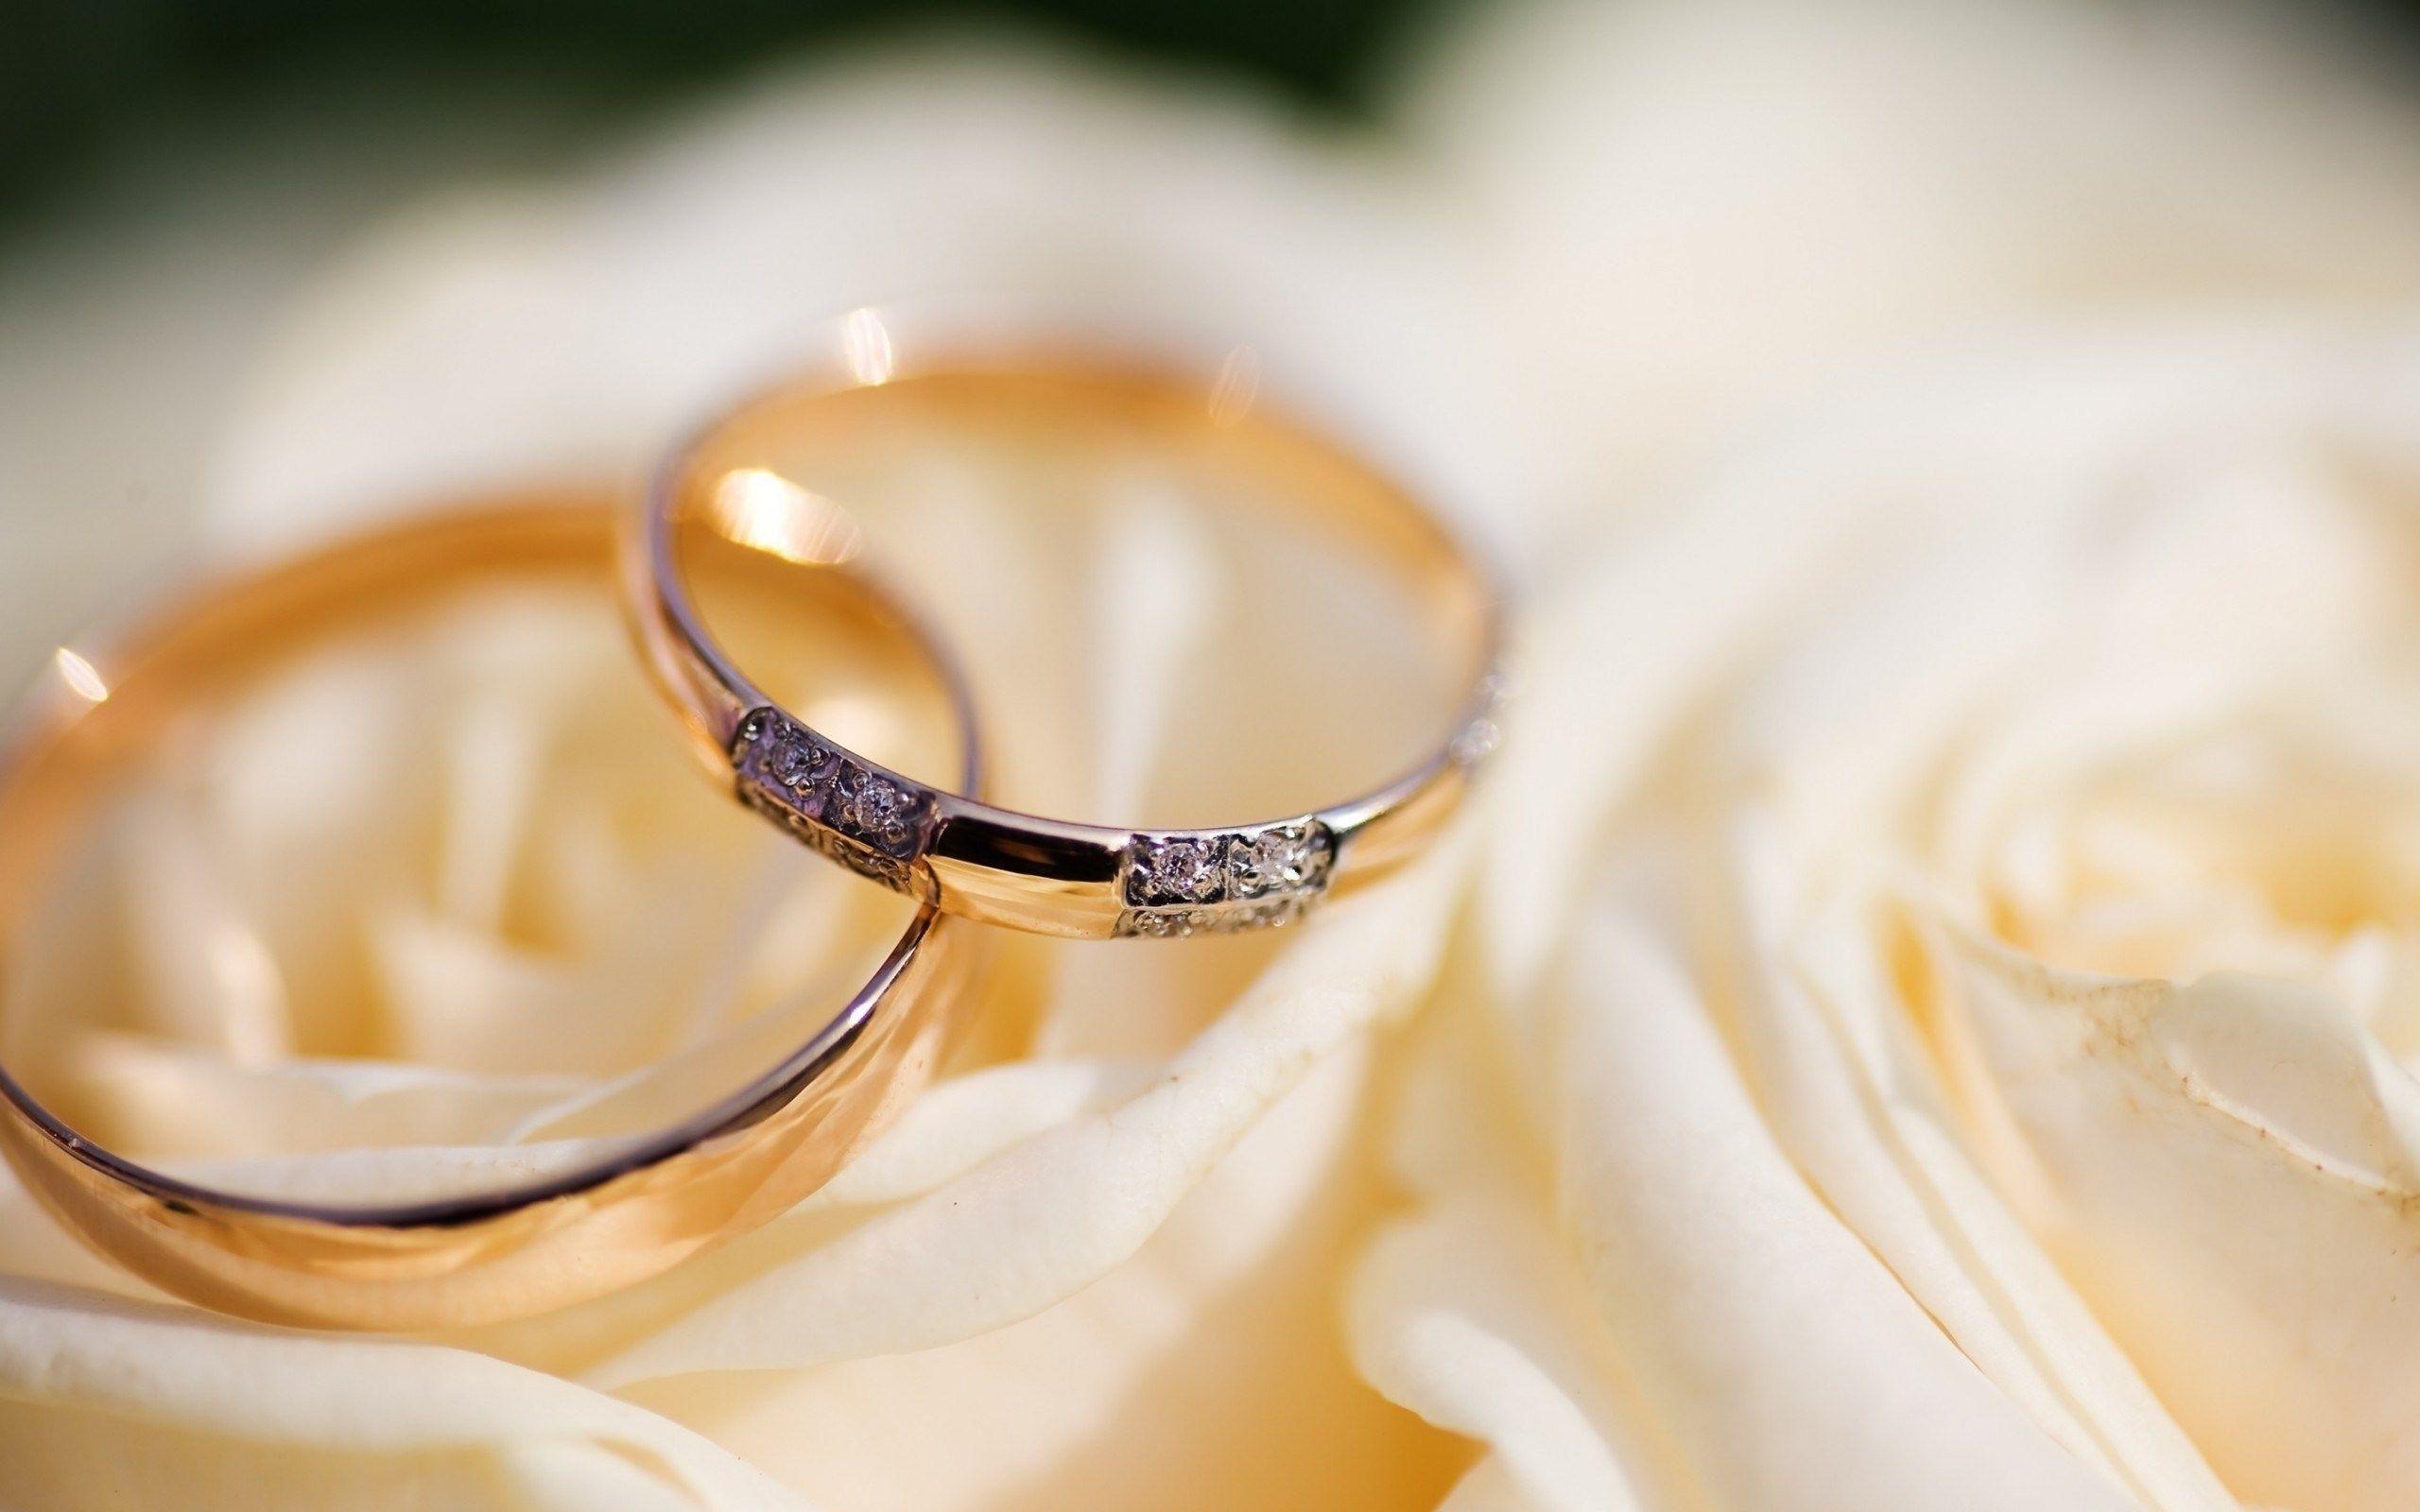 Couple Rings For The Ring Finger